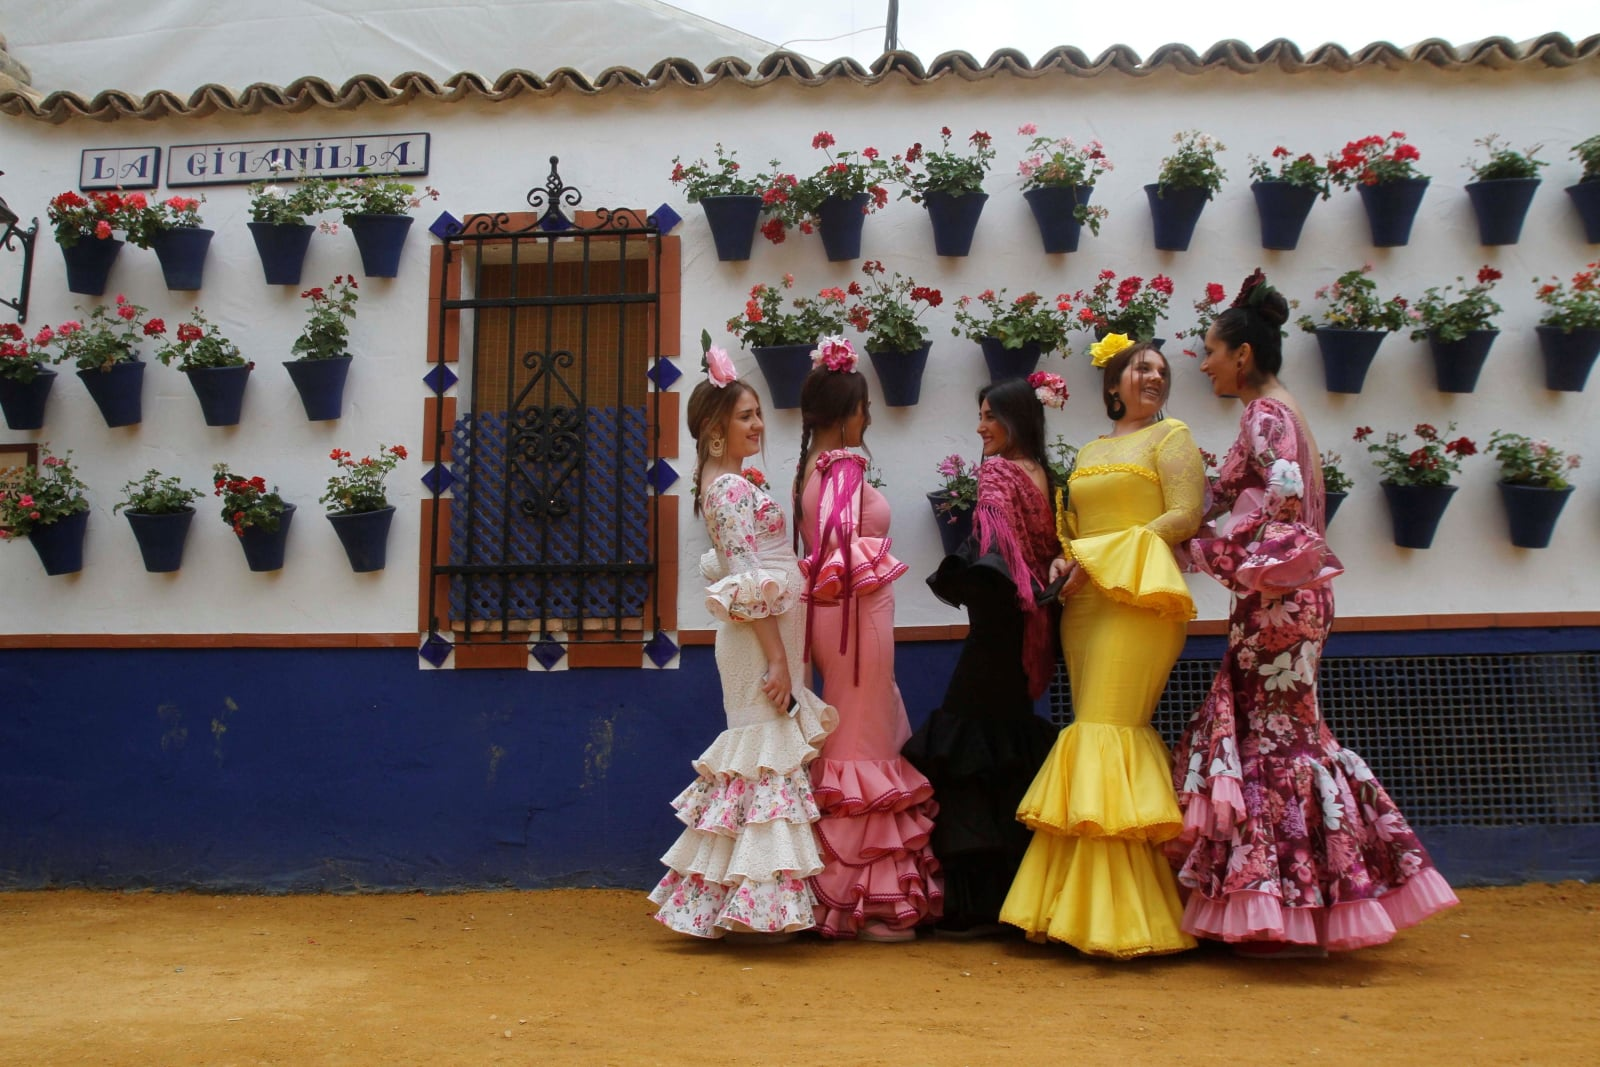 Hiszpańska tradycja flamenco fot. EPA/SALAS